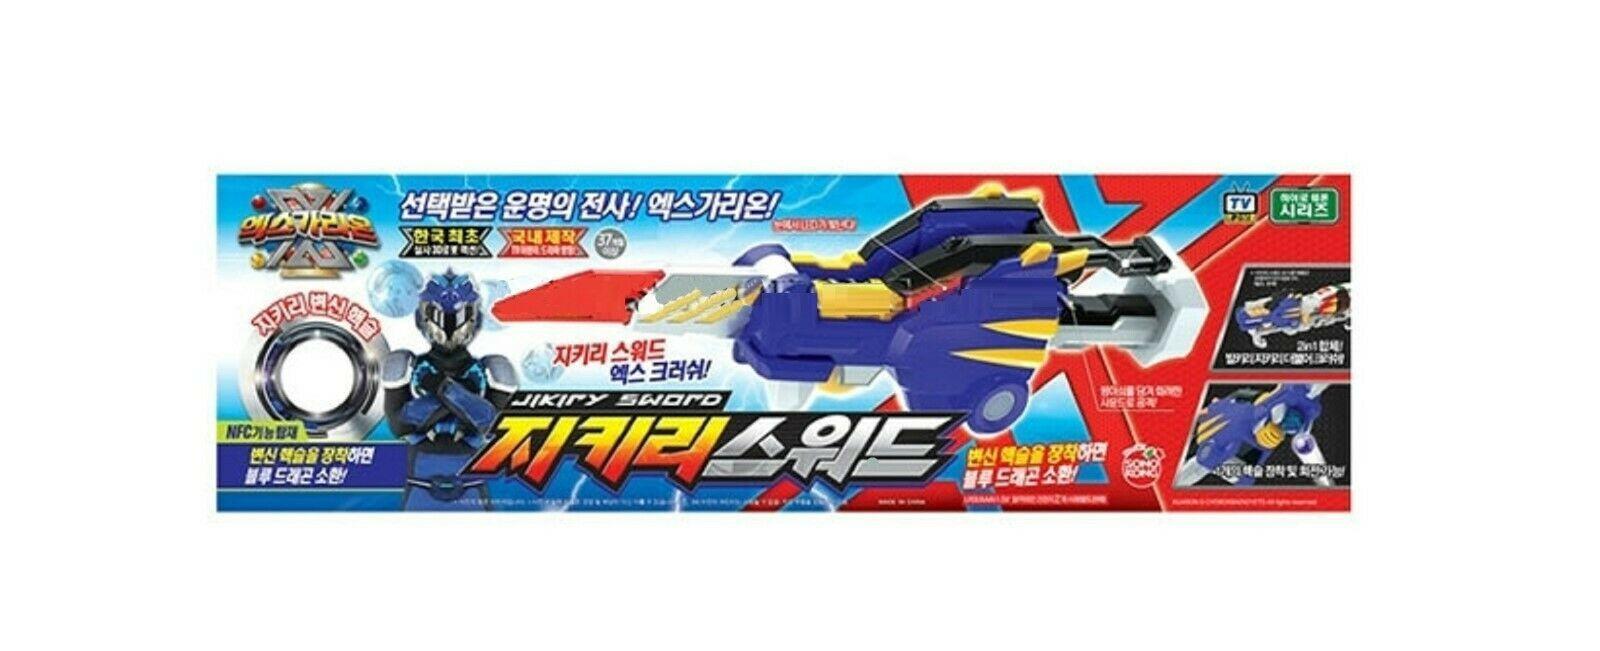 X-Garion Jikiry Sword Hero Sound Toy Weapon